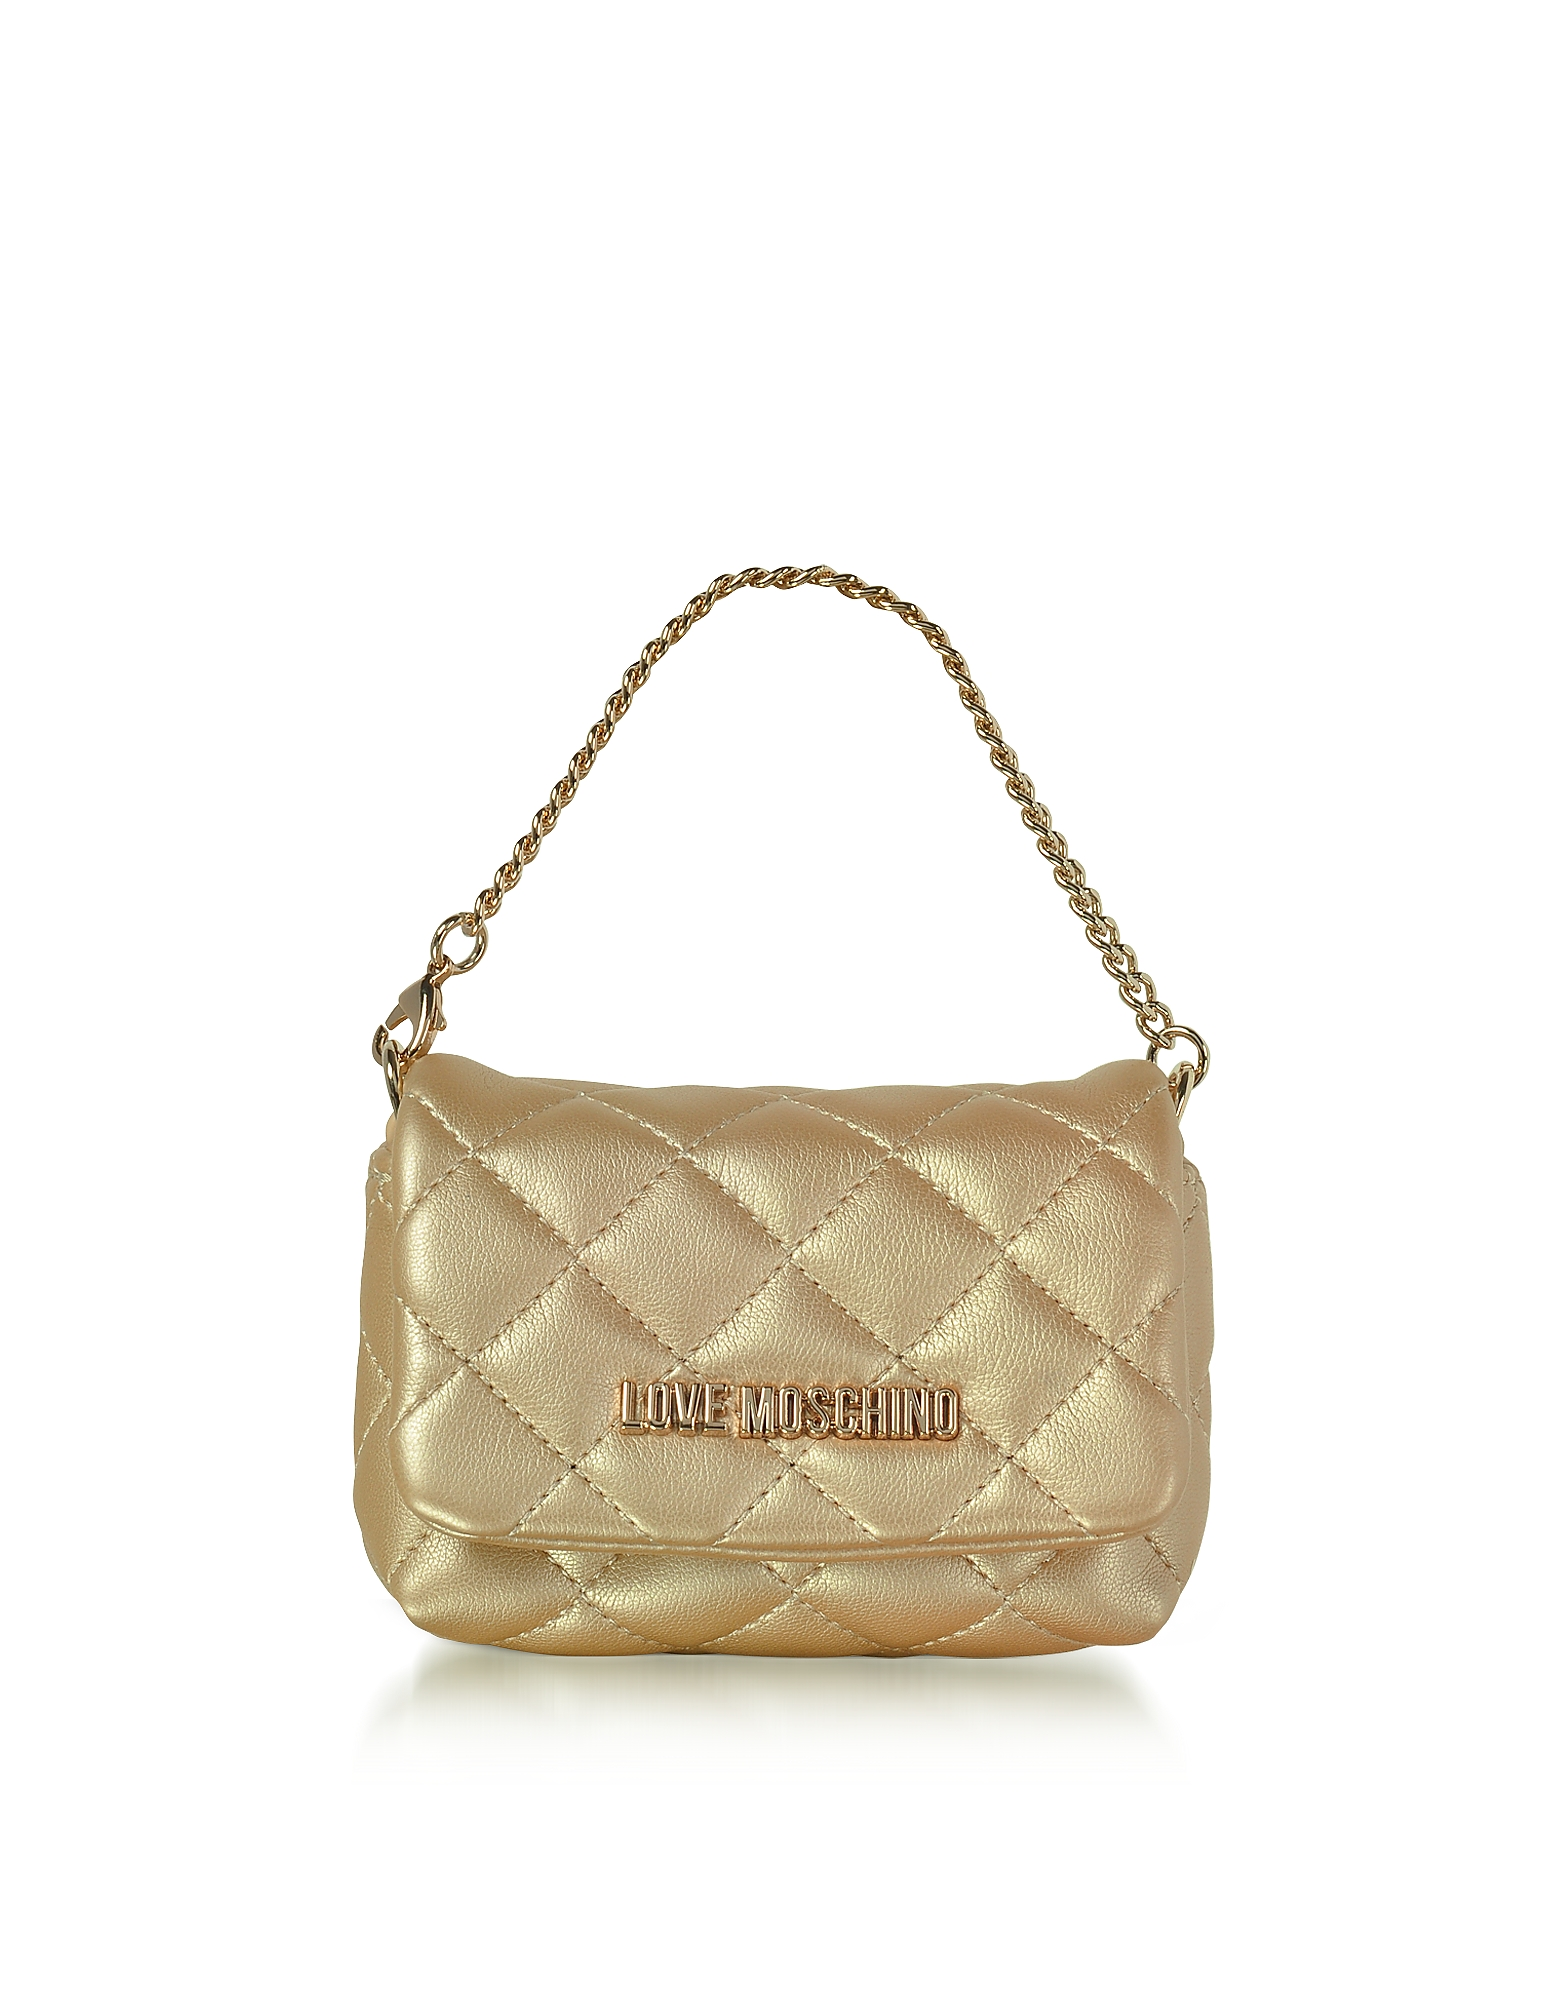 Mini Bag - Золотистый Клатч из Эко Кожи